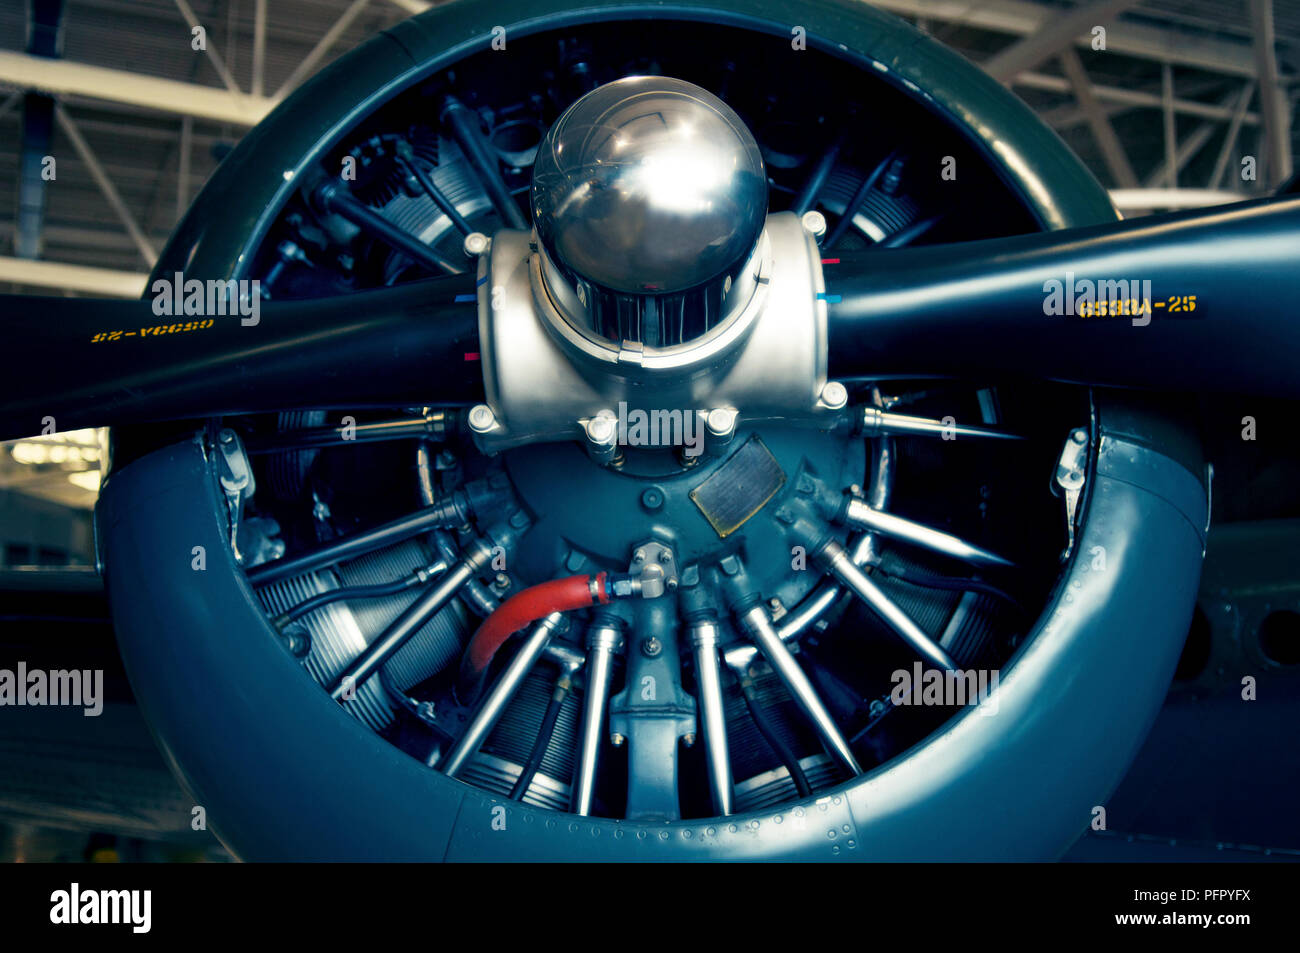 Pratt & Whitney Wasp Engine of 1952 North American Harvard, Canadian Warplane Heritage Museum, Hamilton, Ontario, Canada - Stock Image